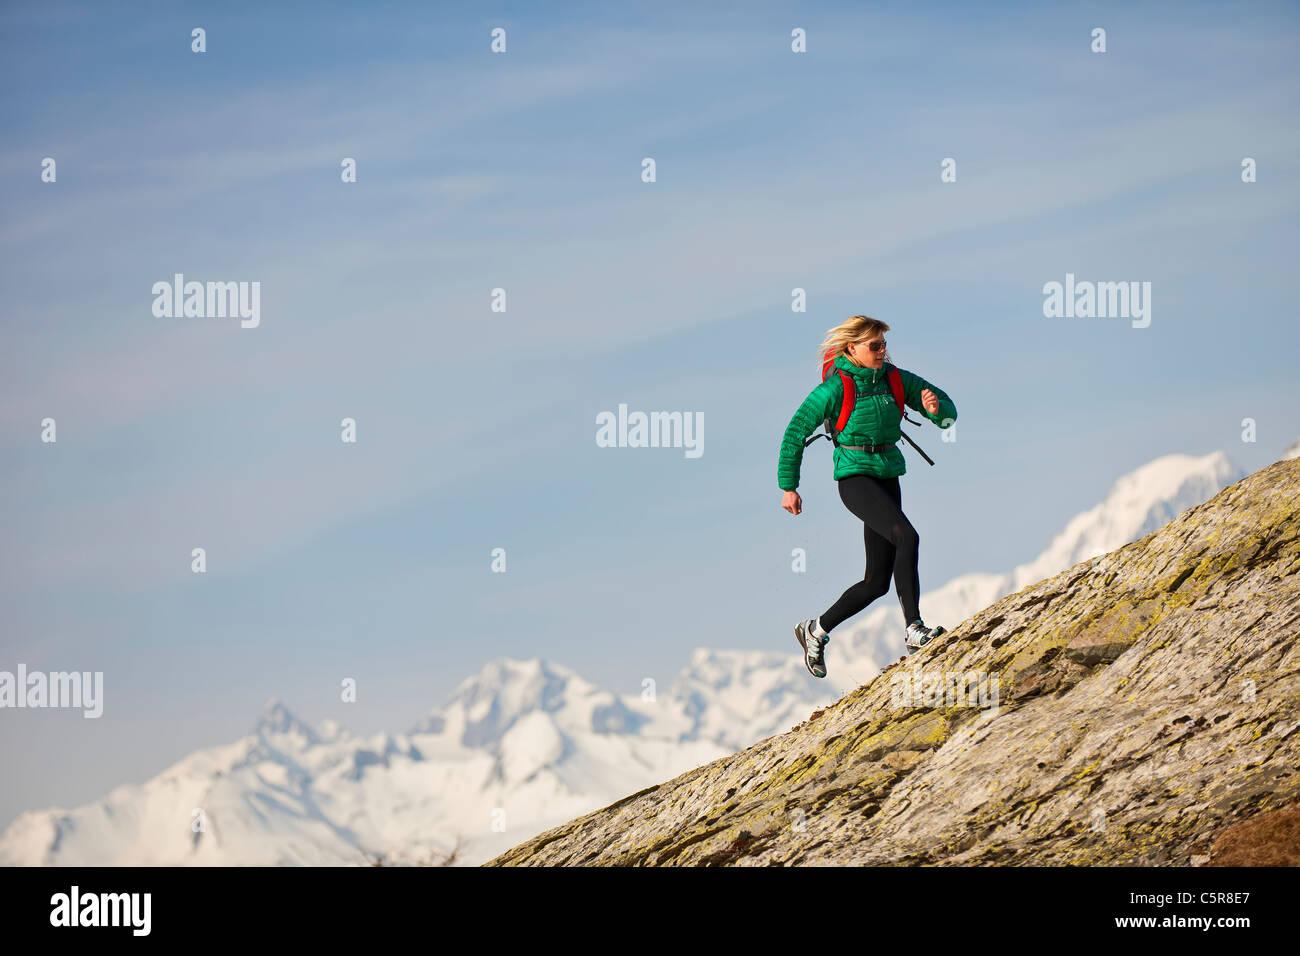 Ein Jogger läuft über Rocky Mountains. Stockbild